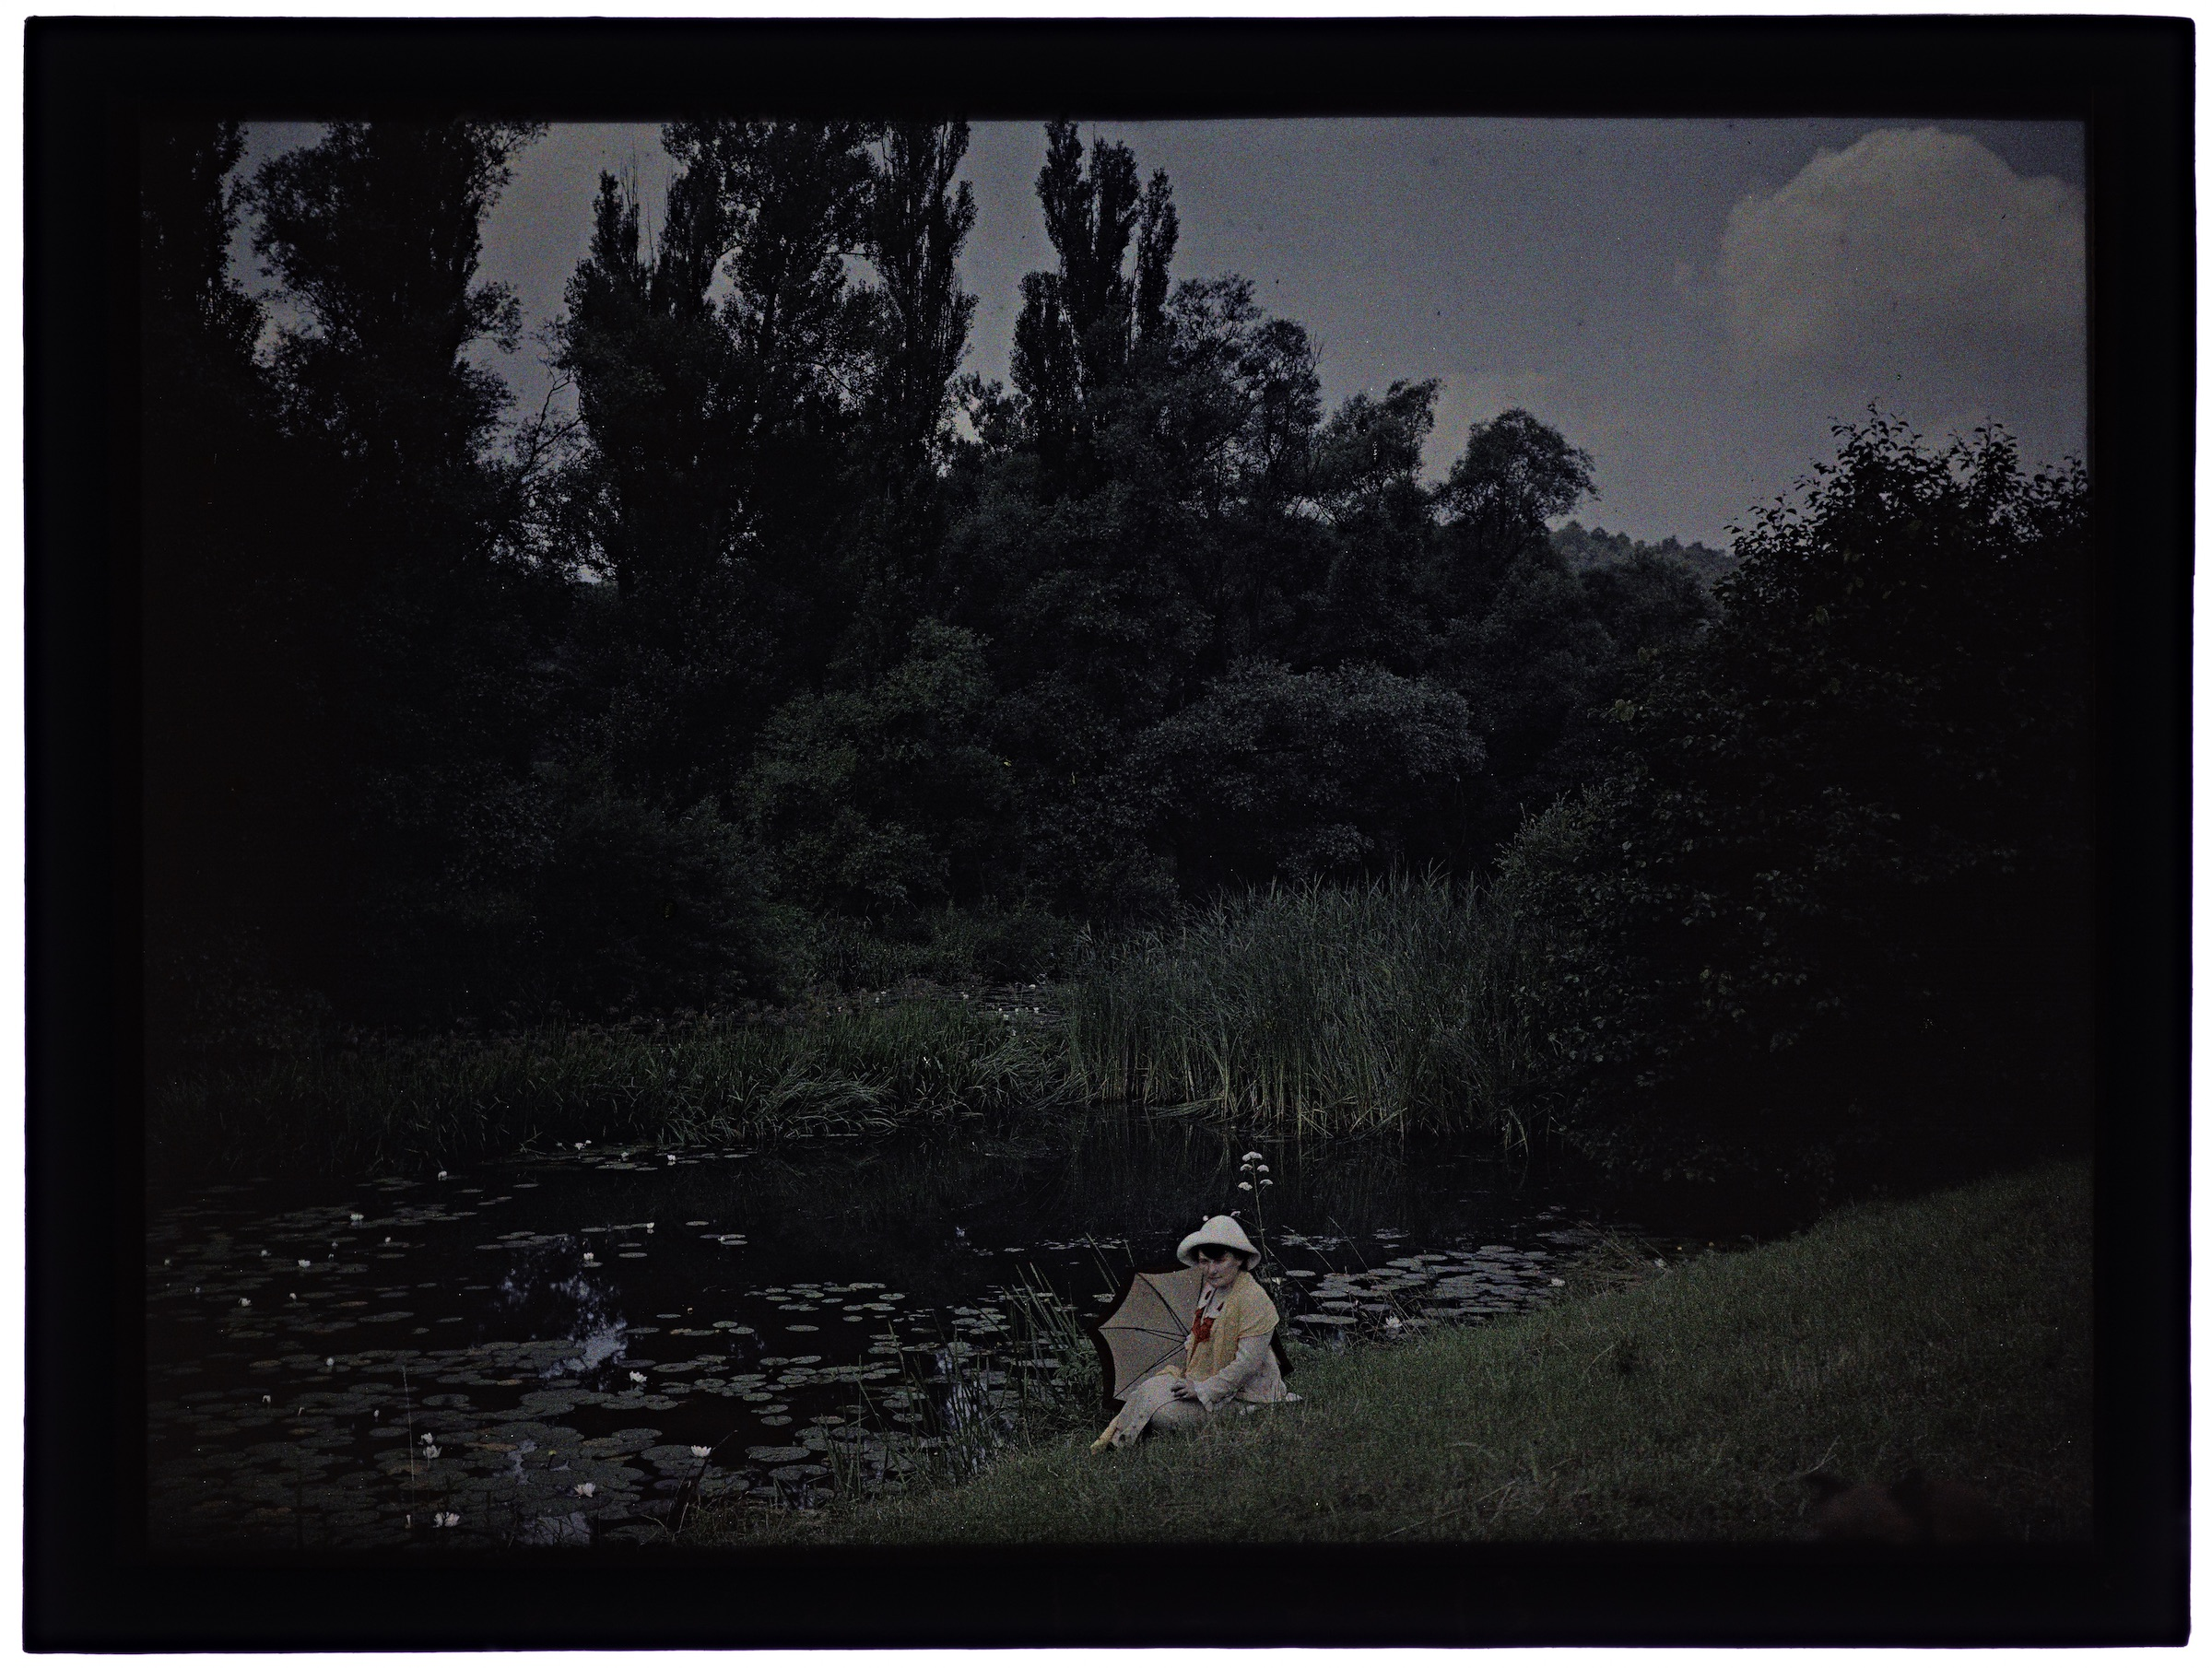 Femme regardant les nénuphars en fleurs